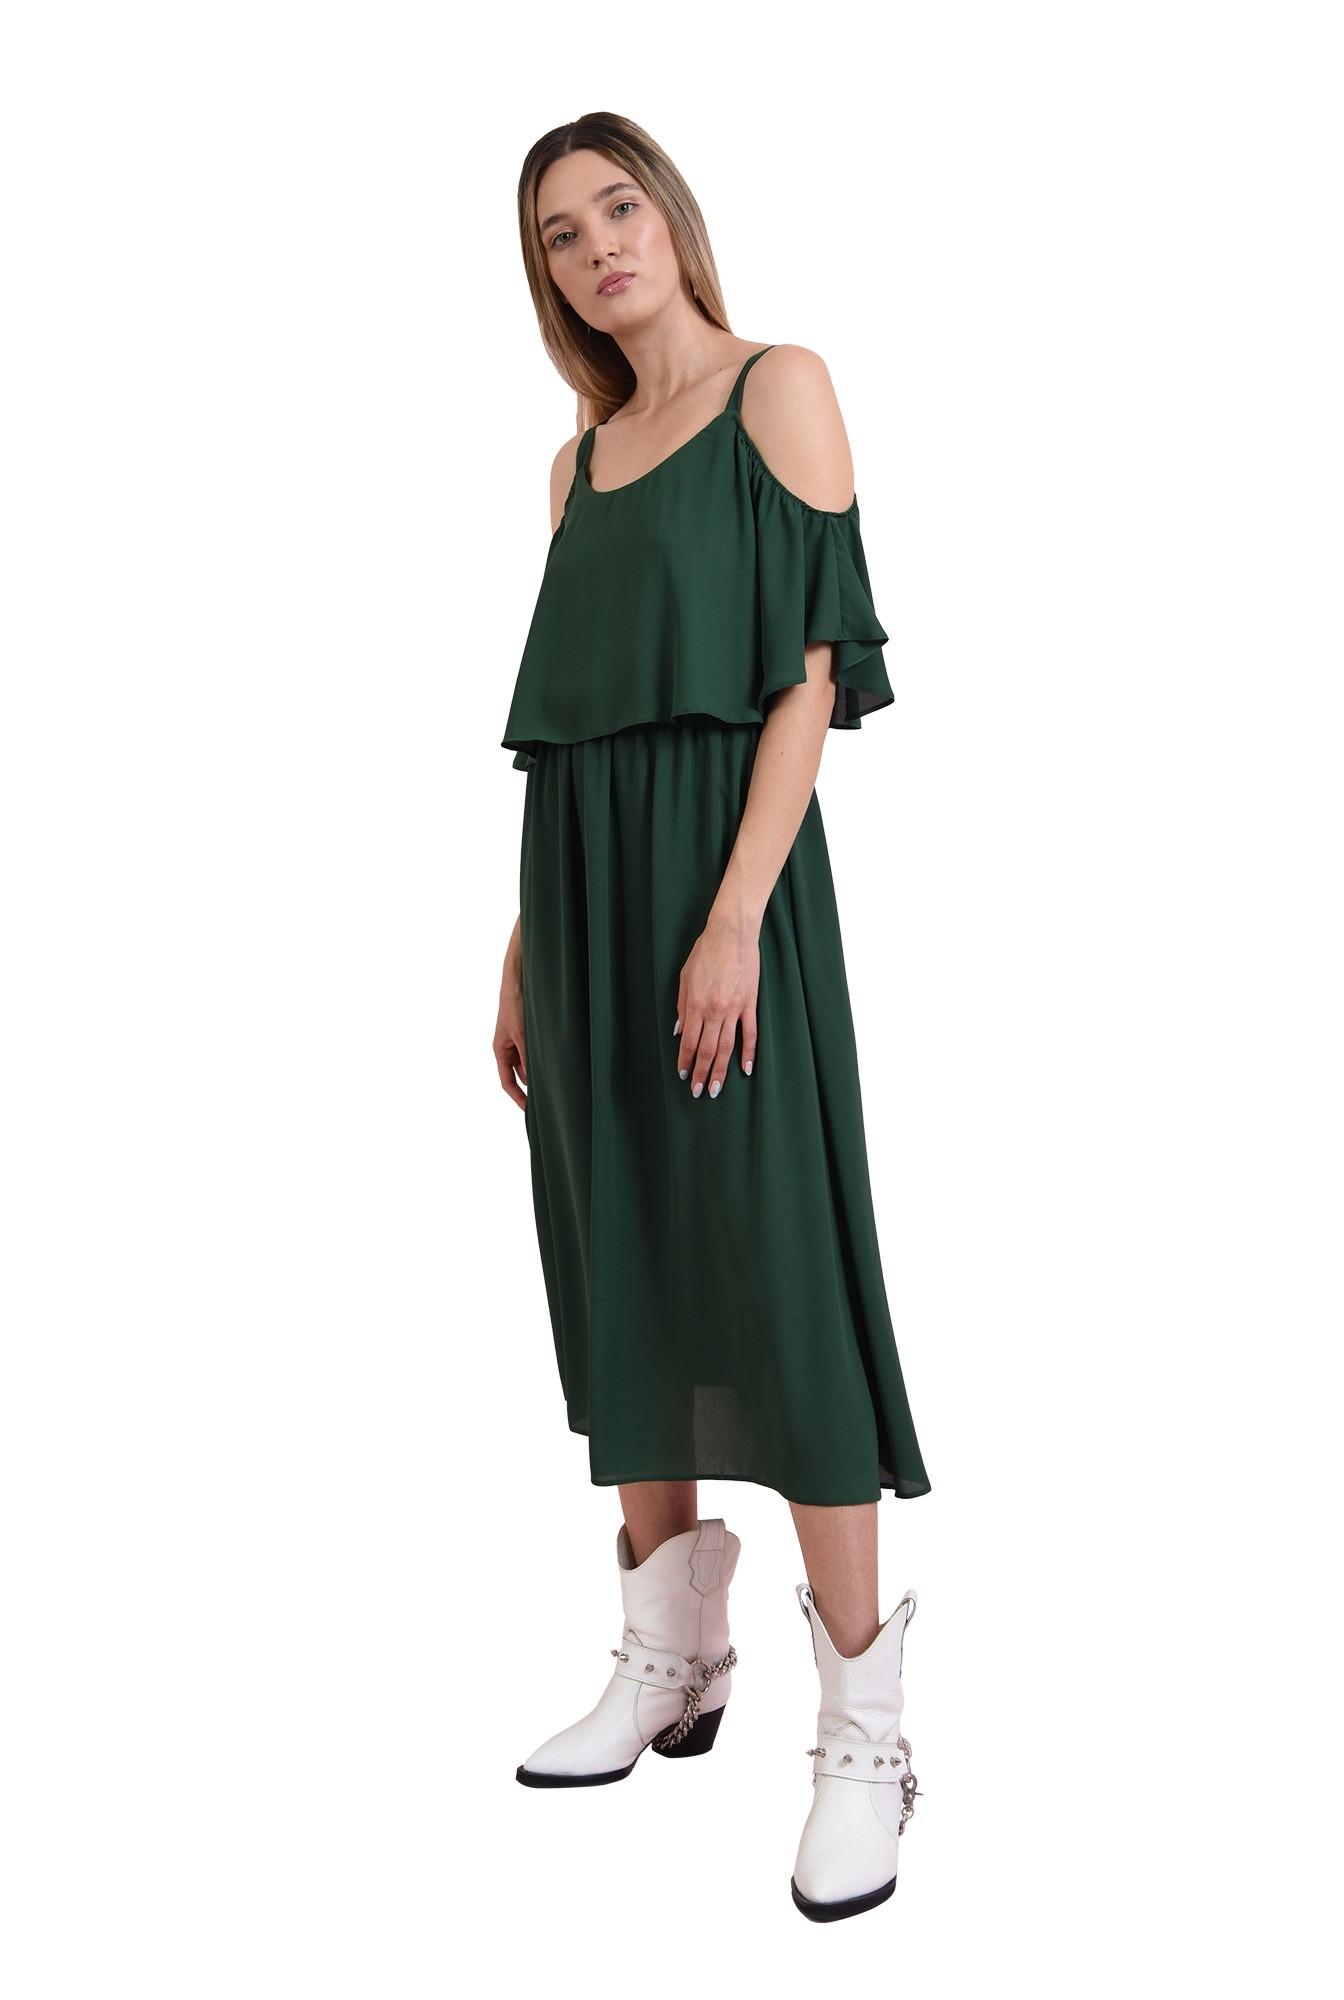 3 - rochie casual, verde, evazata